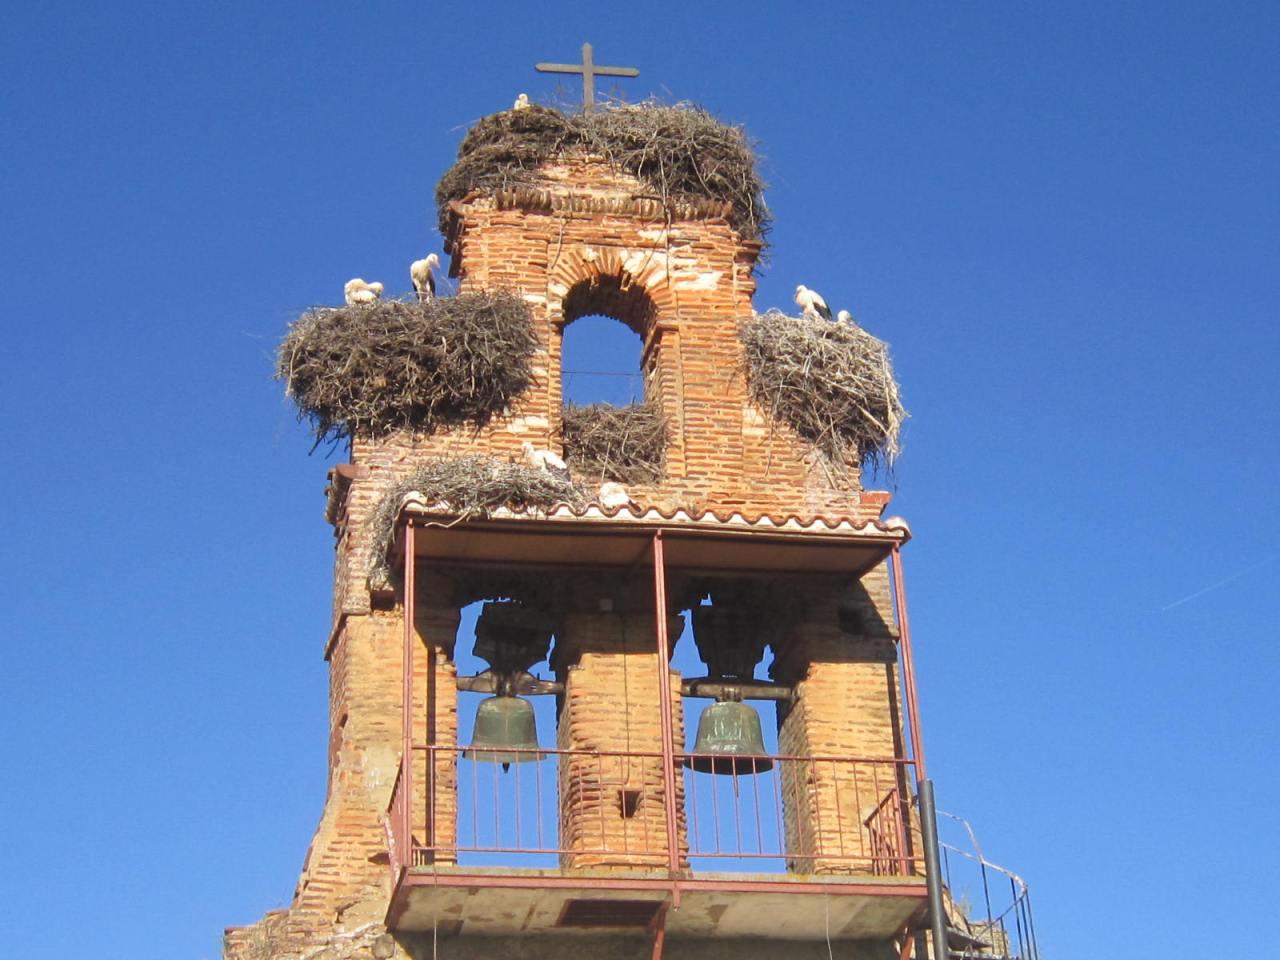 Church stork nesting between Leon and Hospital de Orbigo (on the Camino Frances/FrenchWay)